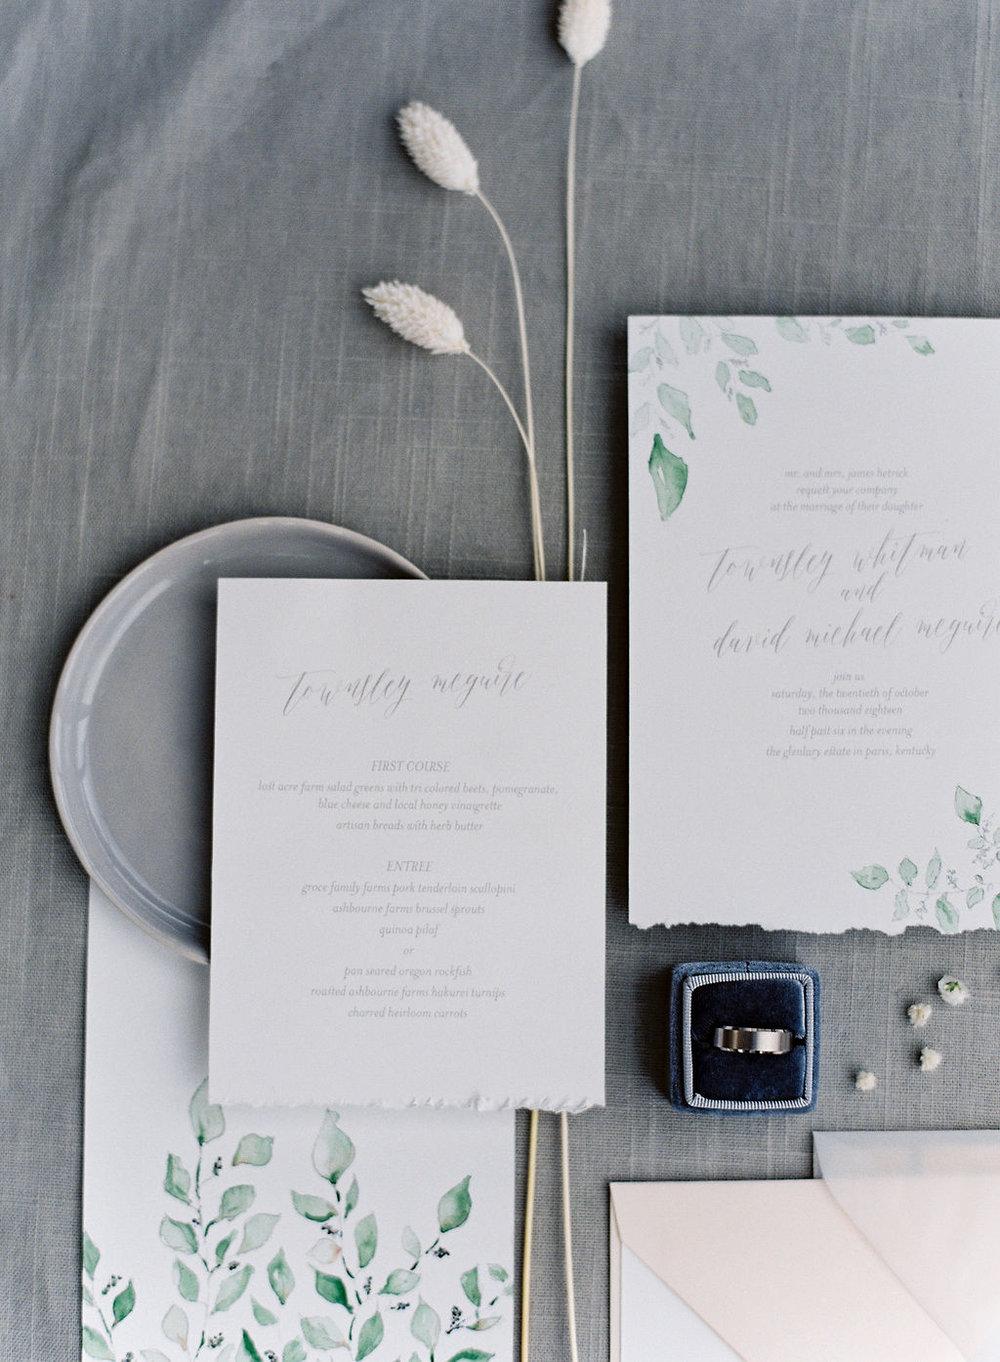 speed-art-museum-wedding-louisville-wedding-planner-invitations.jpg